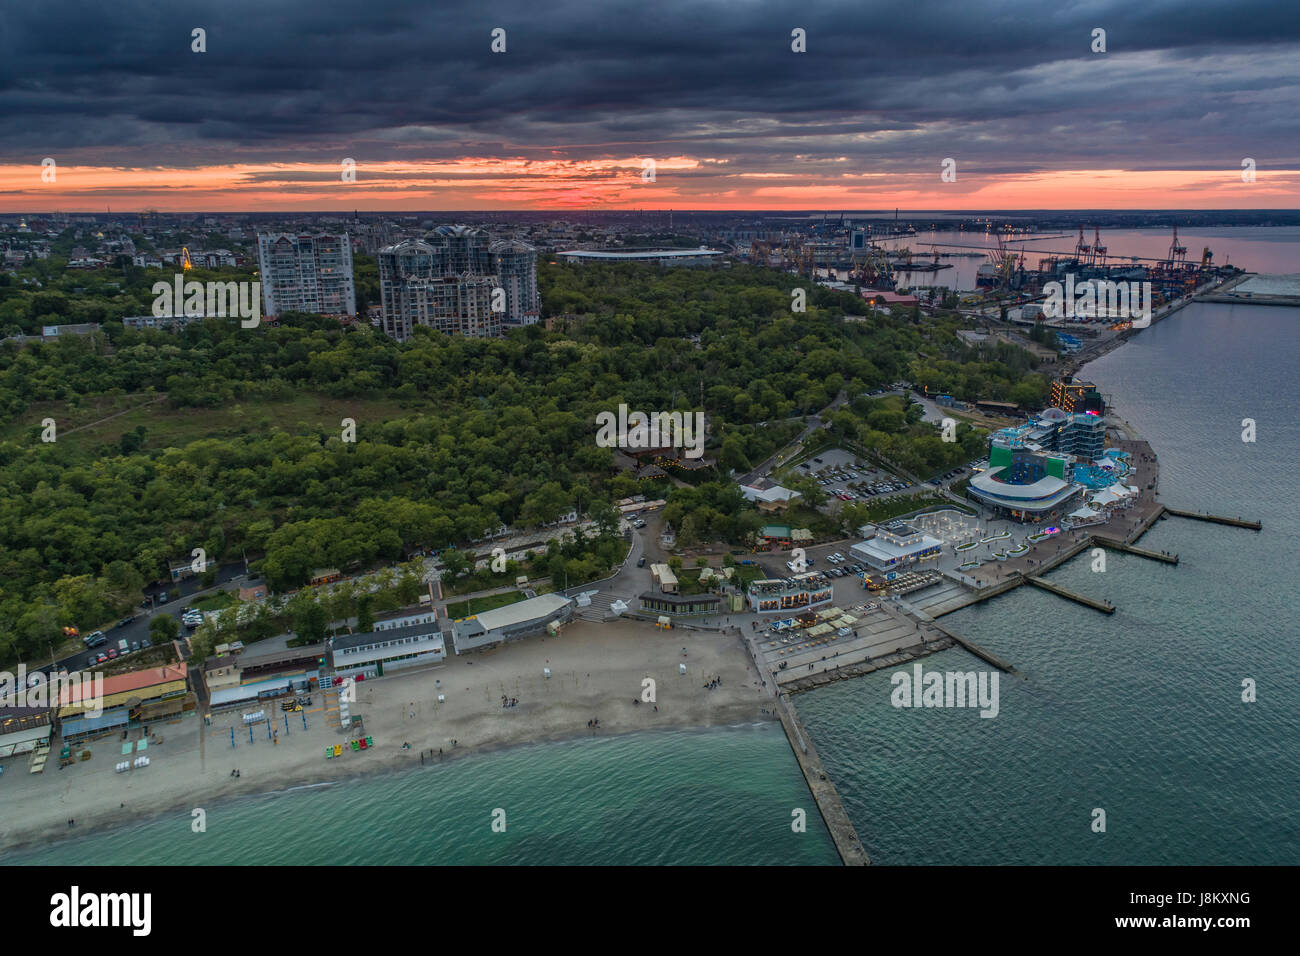 Antenna fuco immagine di langeron beach e parco shevchenka in Odessa Ucraina Foto Stock